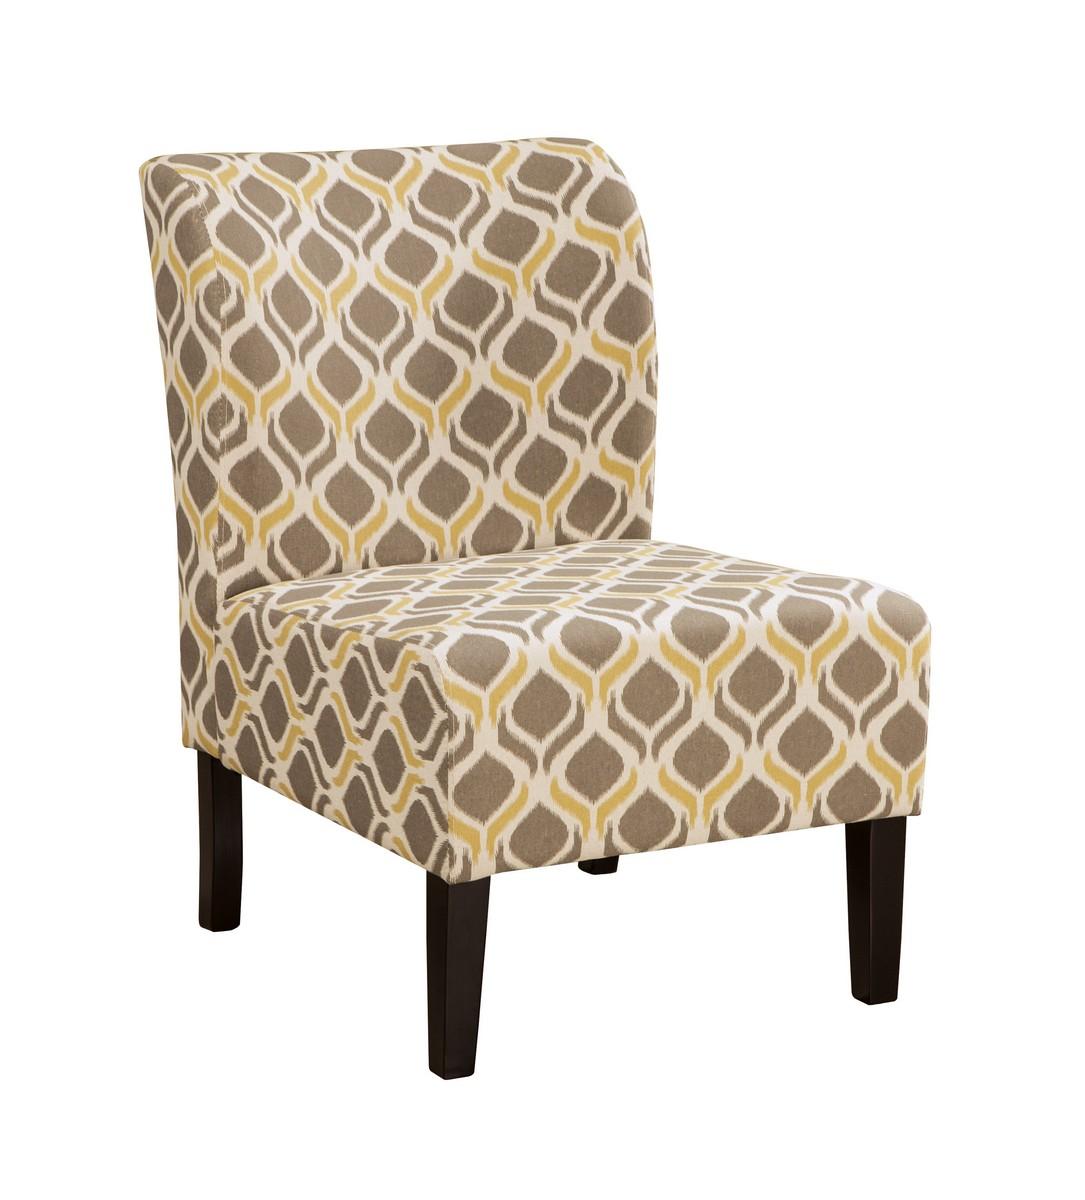 Ashley Honnally Accent Chair - Gunmetal